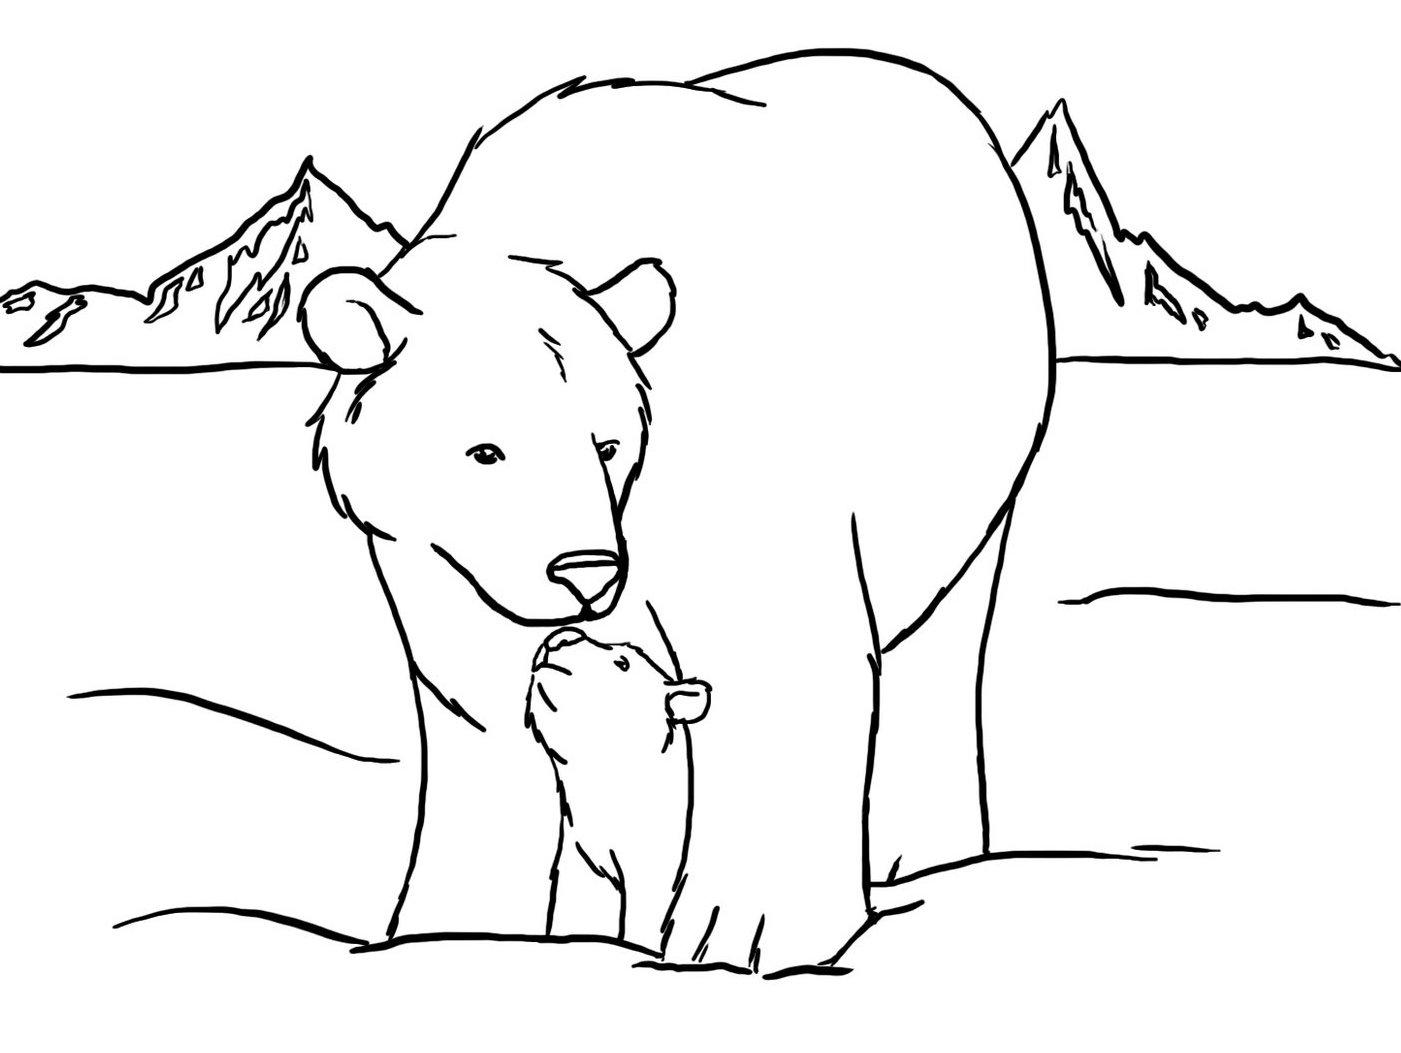 Drawn polar  bear coloring page Free Polar Two Inside Polar